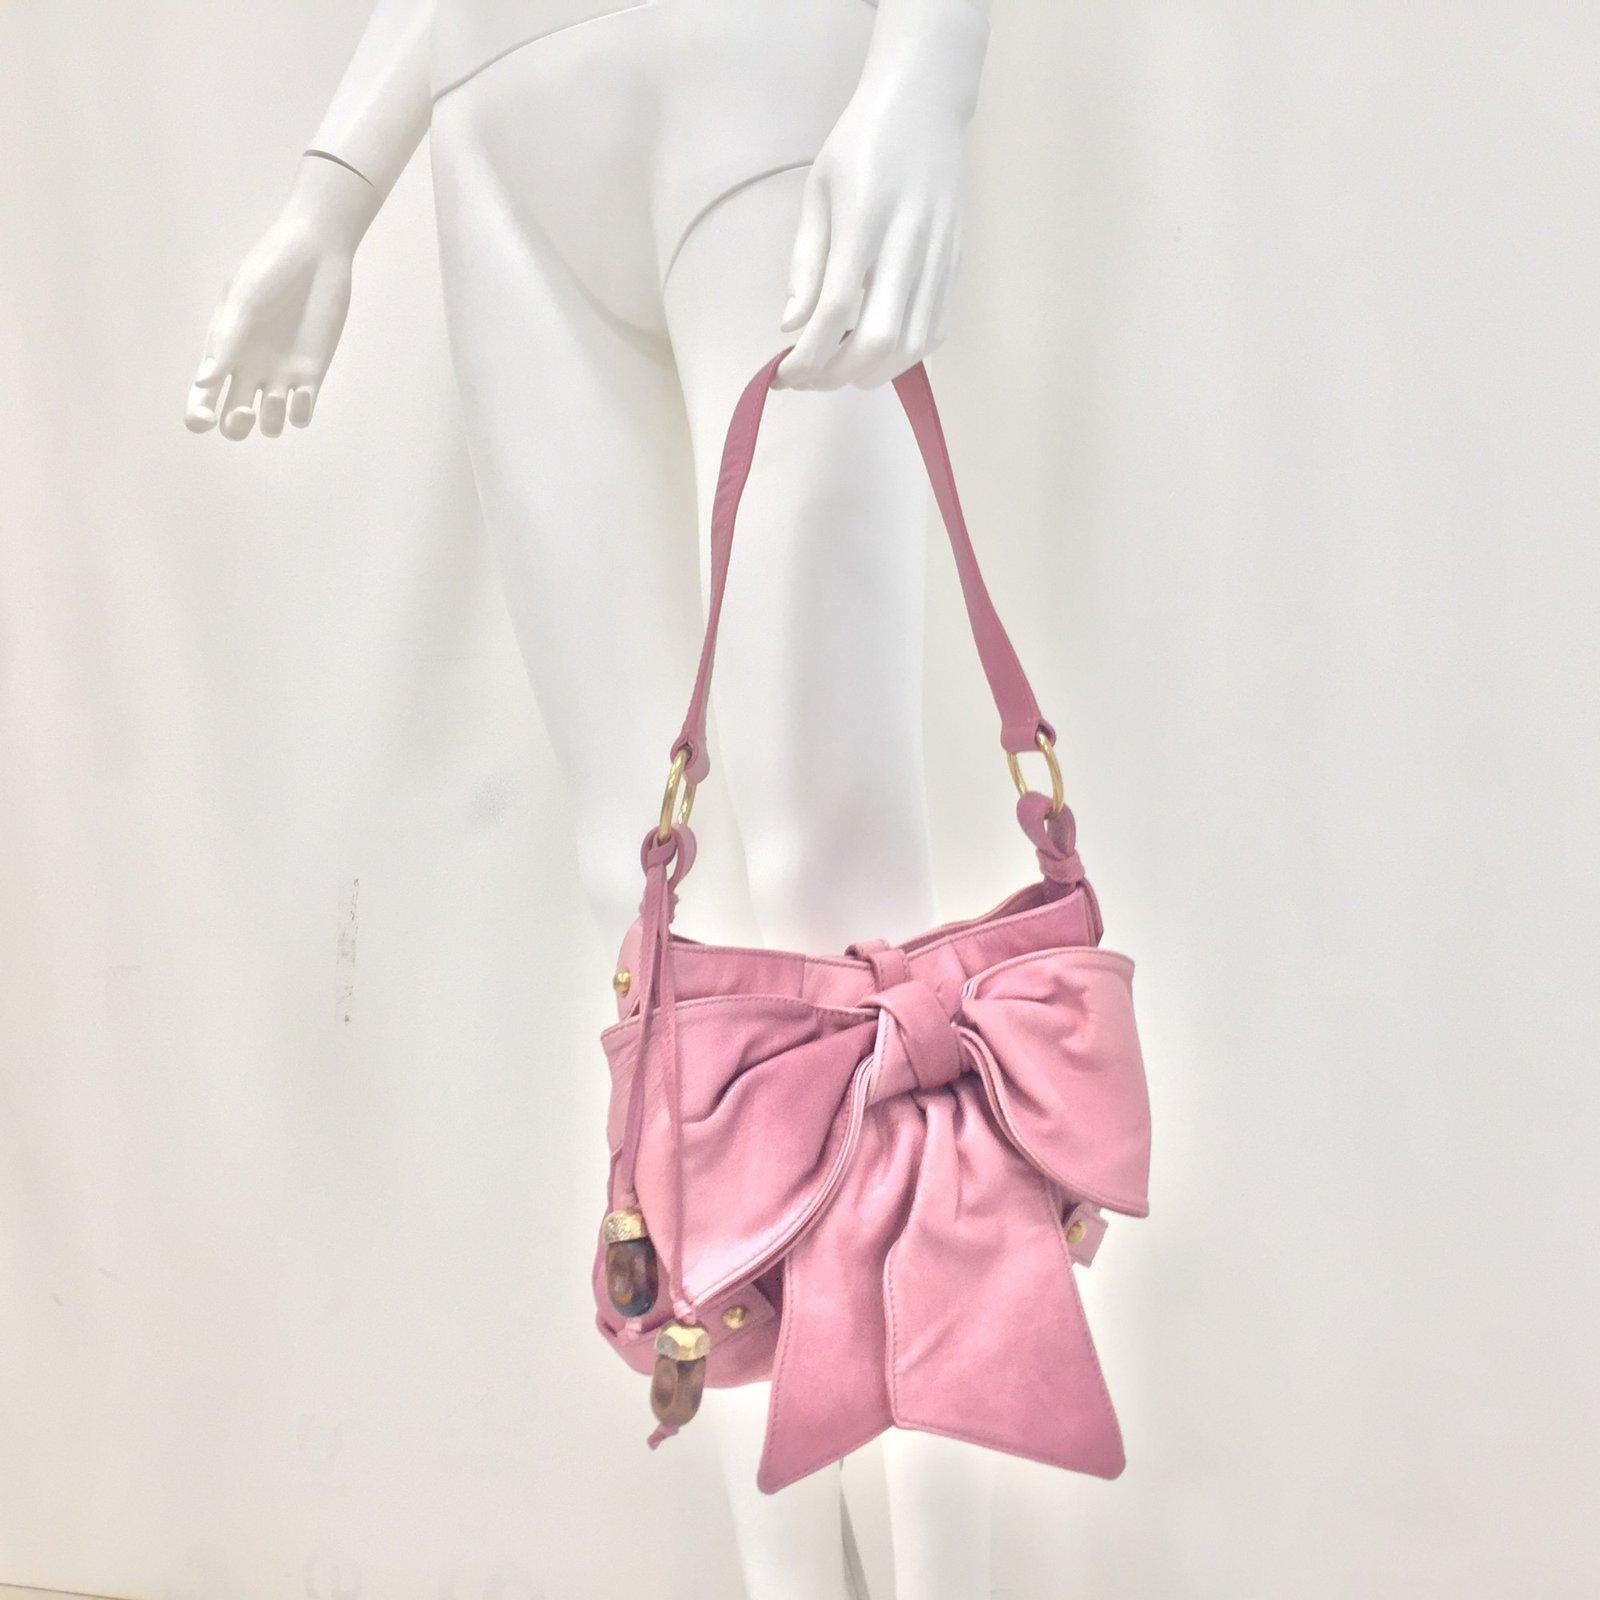 Facebook · Pin This. Yves Saint Laurent Handbag Handbags Leather Pink ref. 69657 470bc9db1d